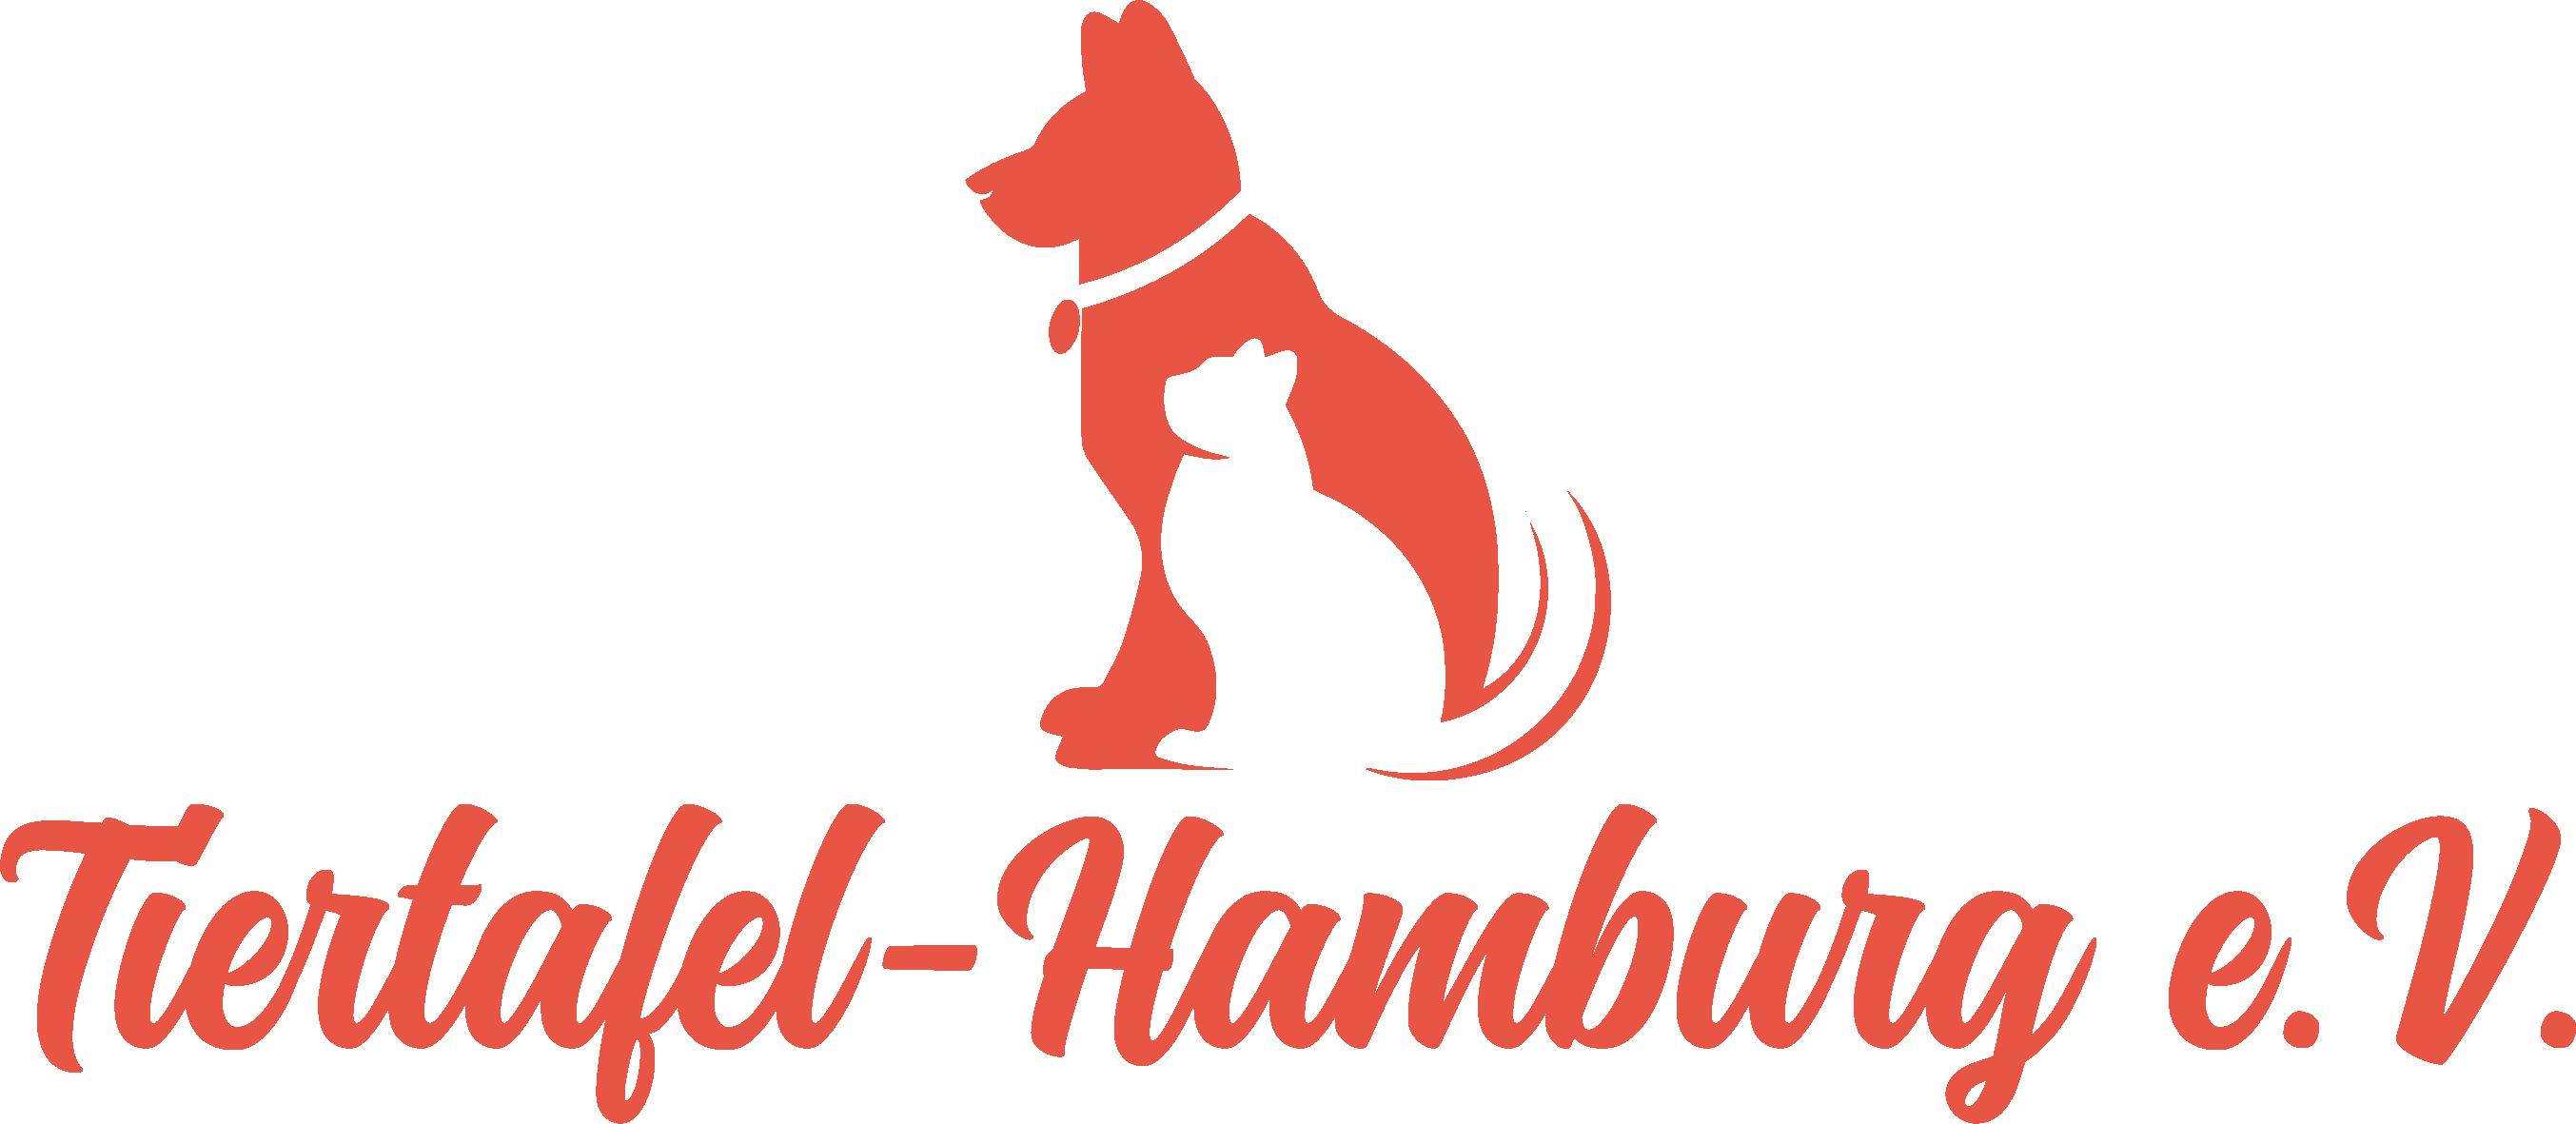 Tiertafel Hamburg